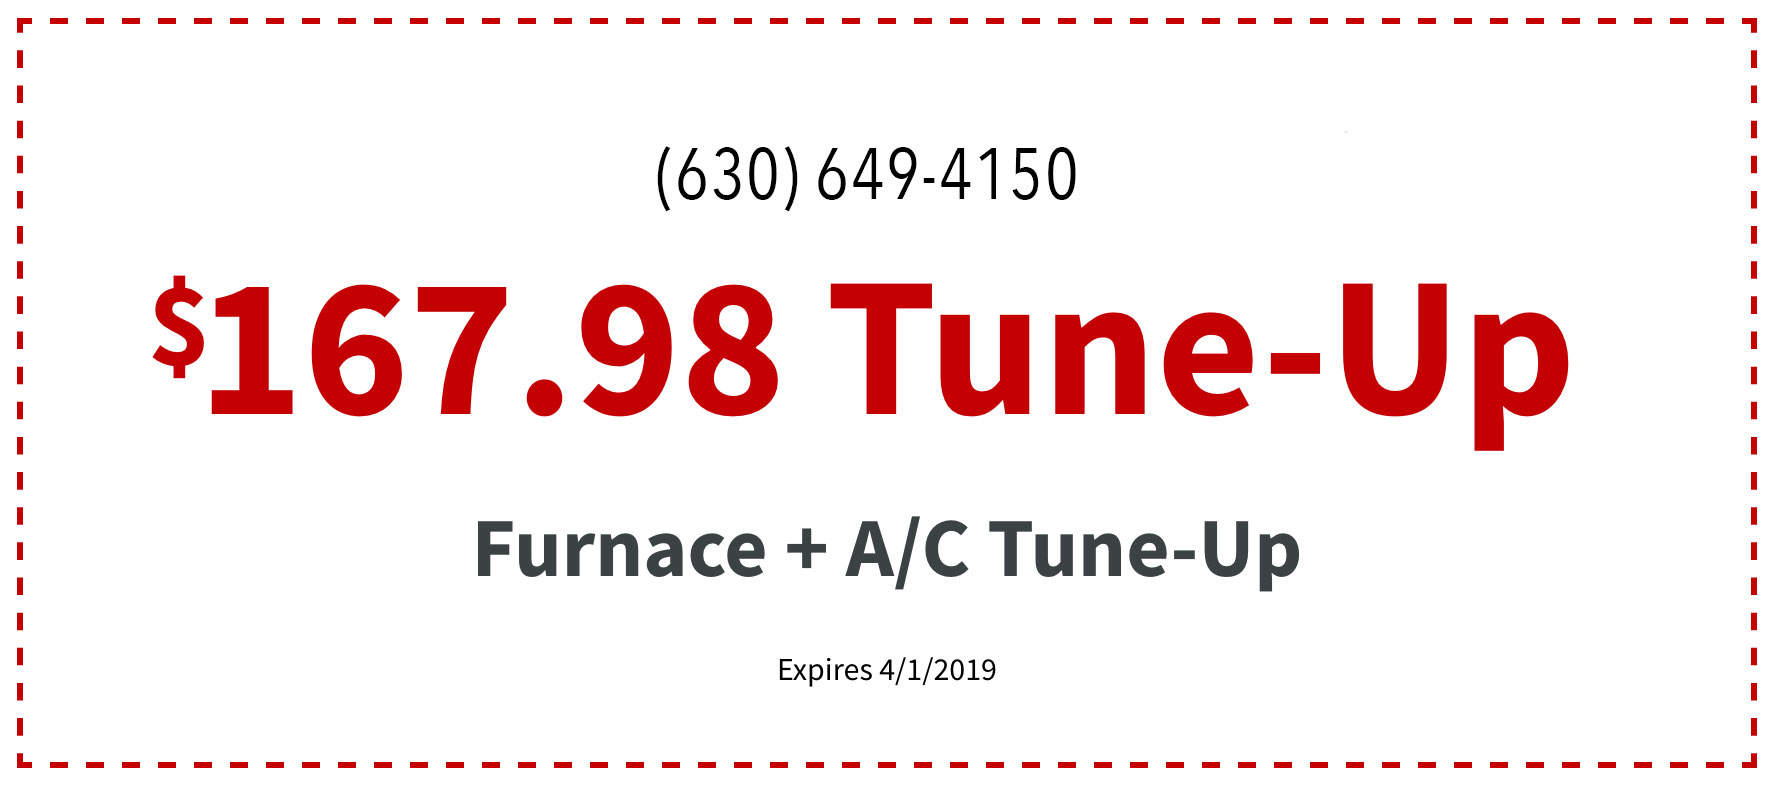 167.98 Tune-Up